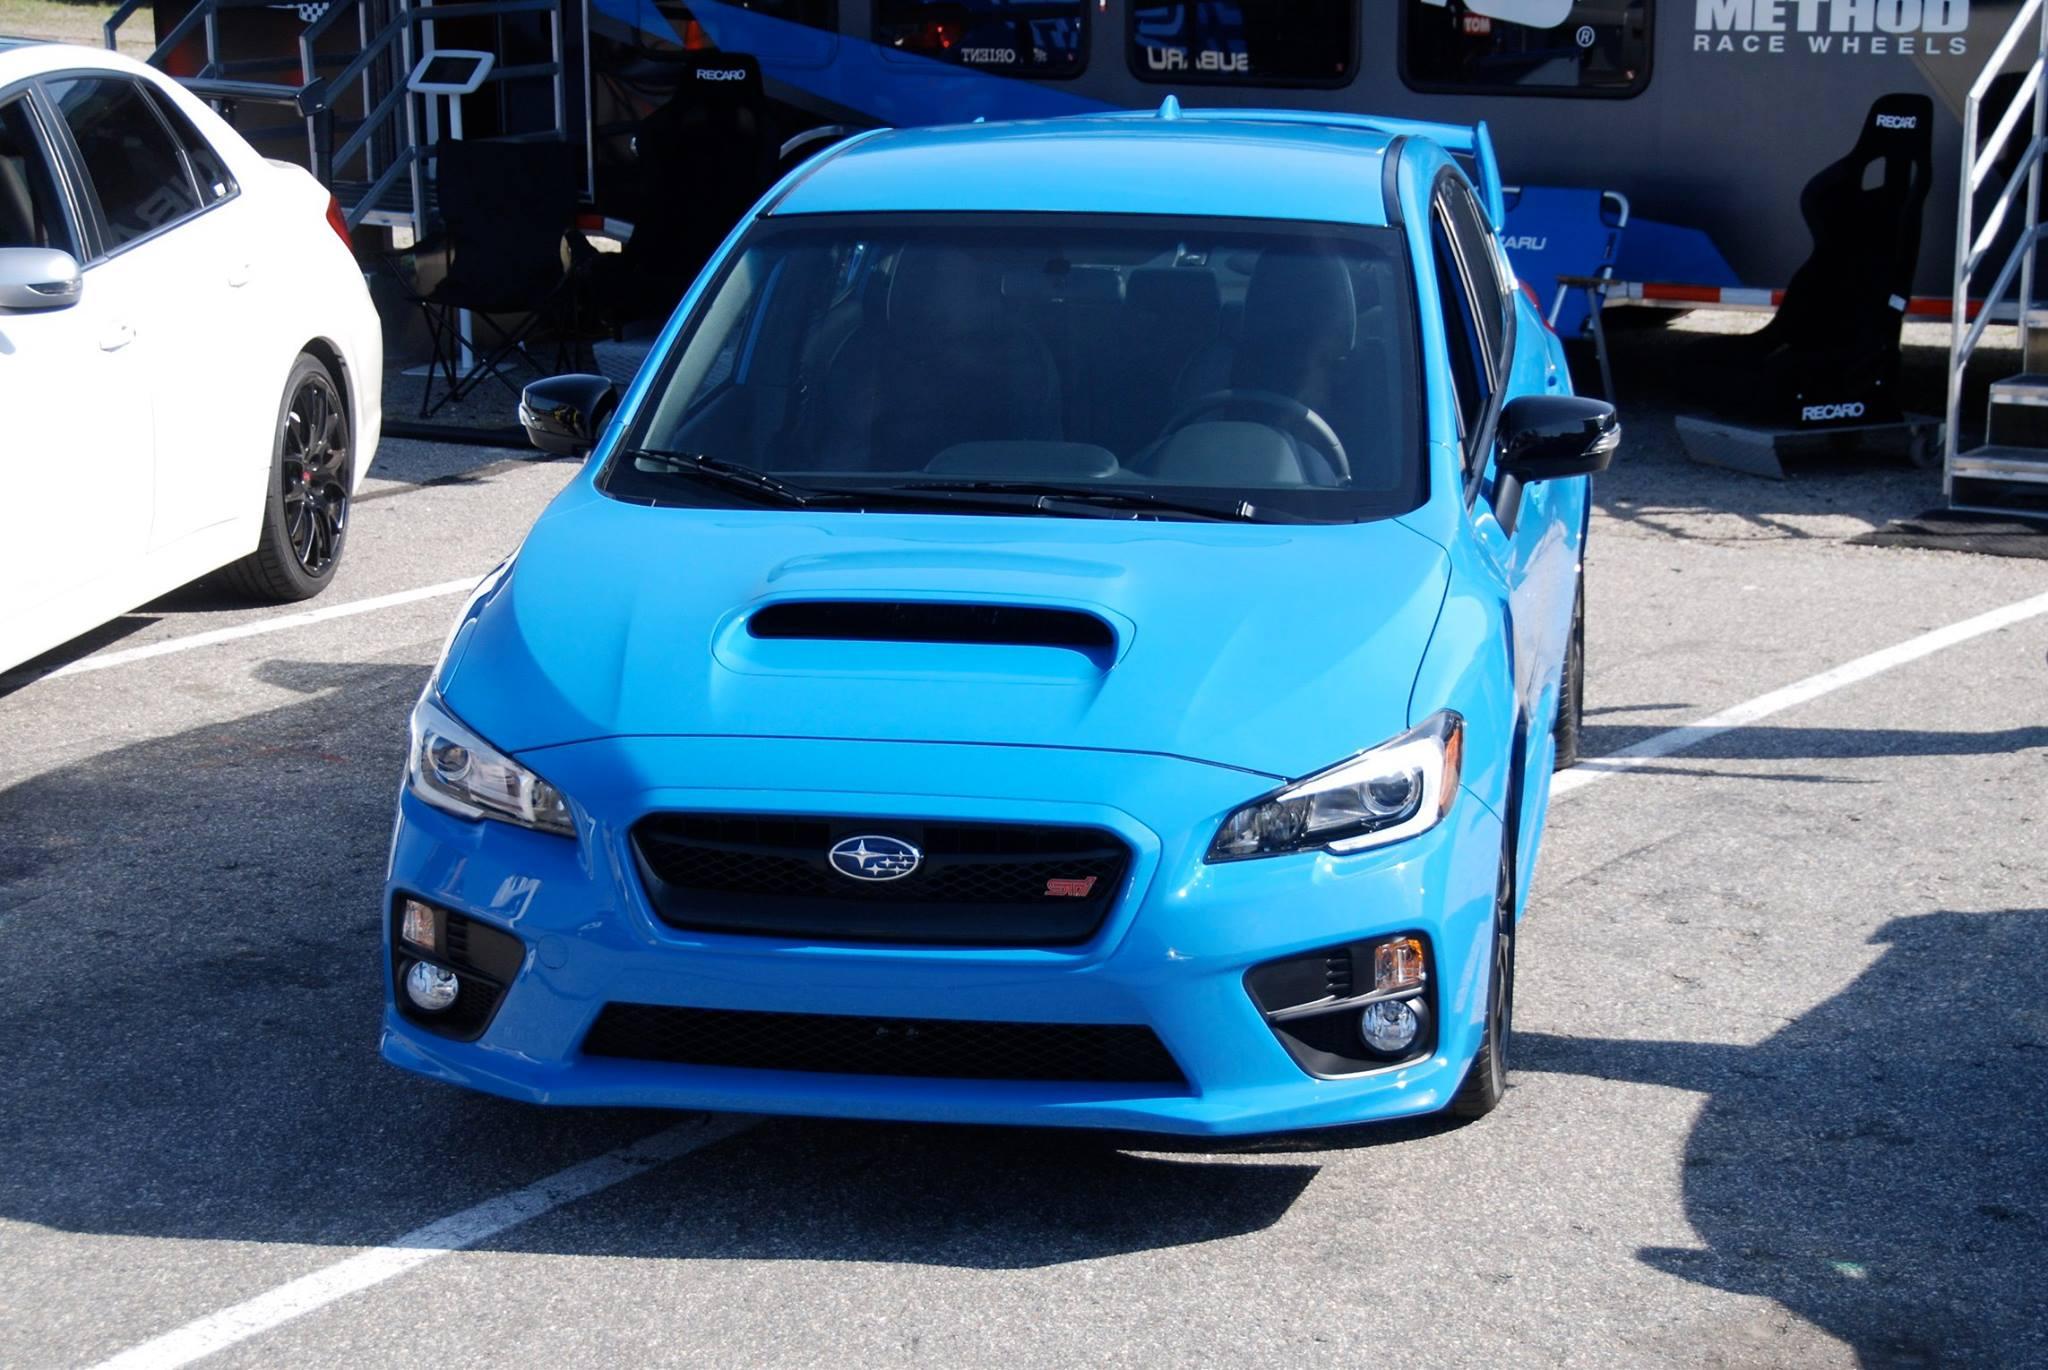 Subaru Wrx Sti Brz Hyper Blue 3